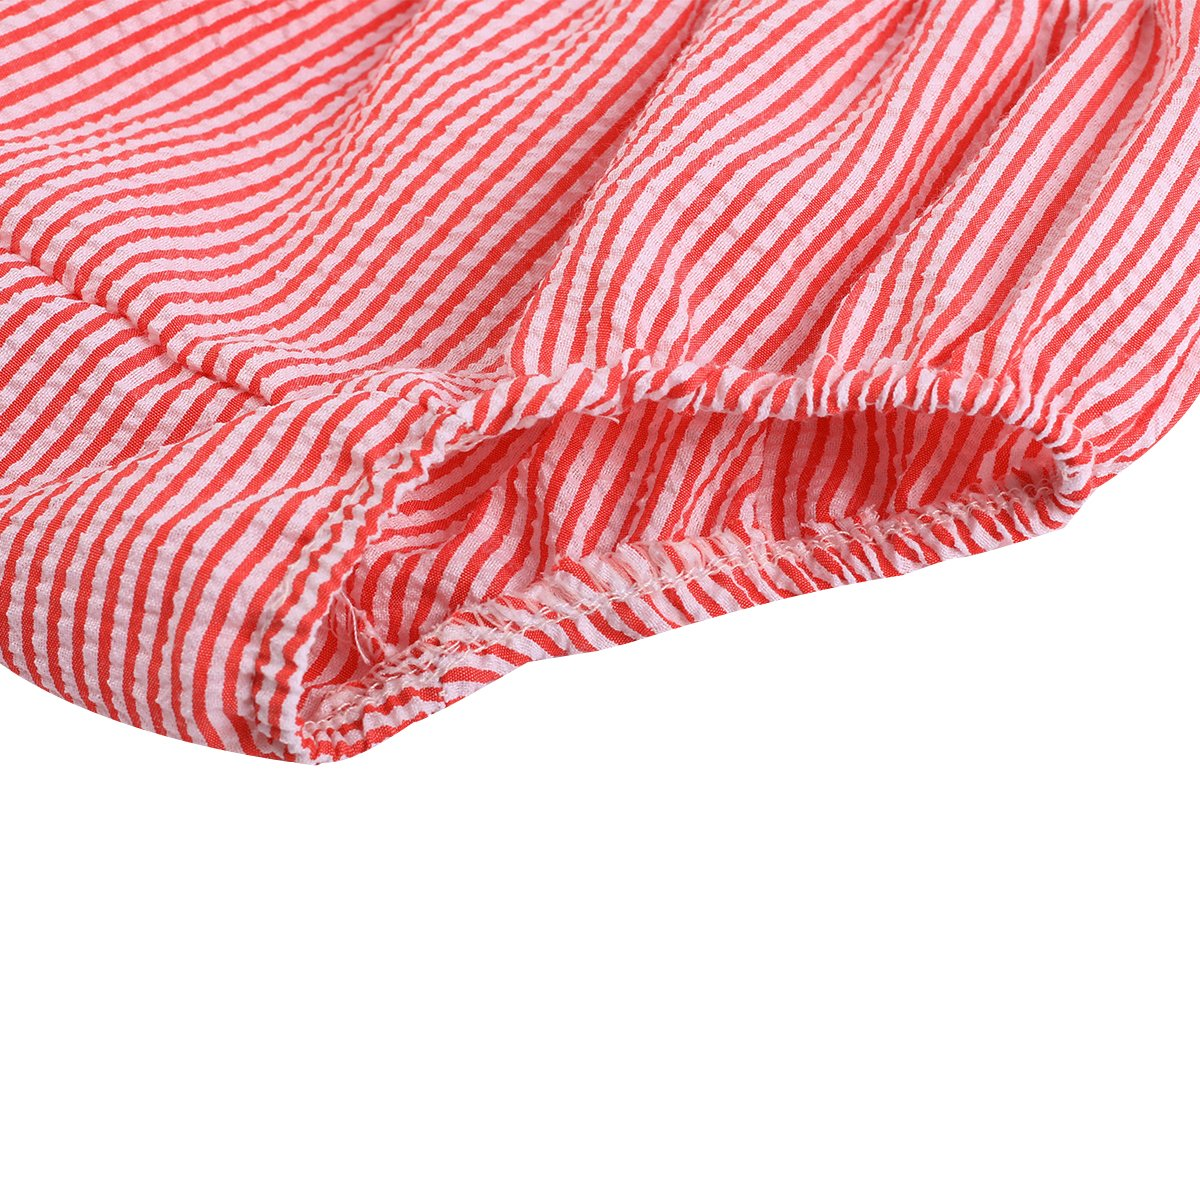 Baby Girl Boy Toddler Cotton Basic Diaper Cover Bloomers Short Underwear Panties